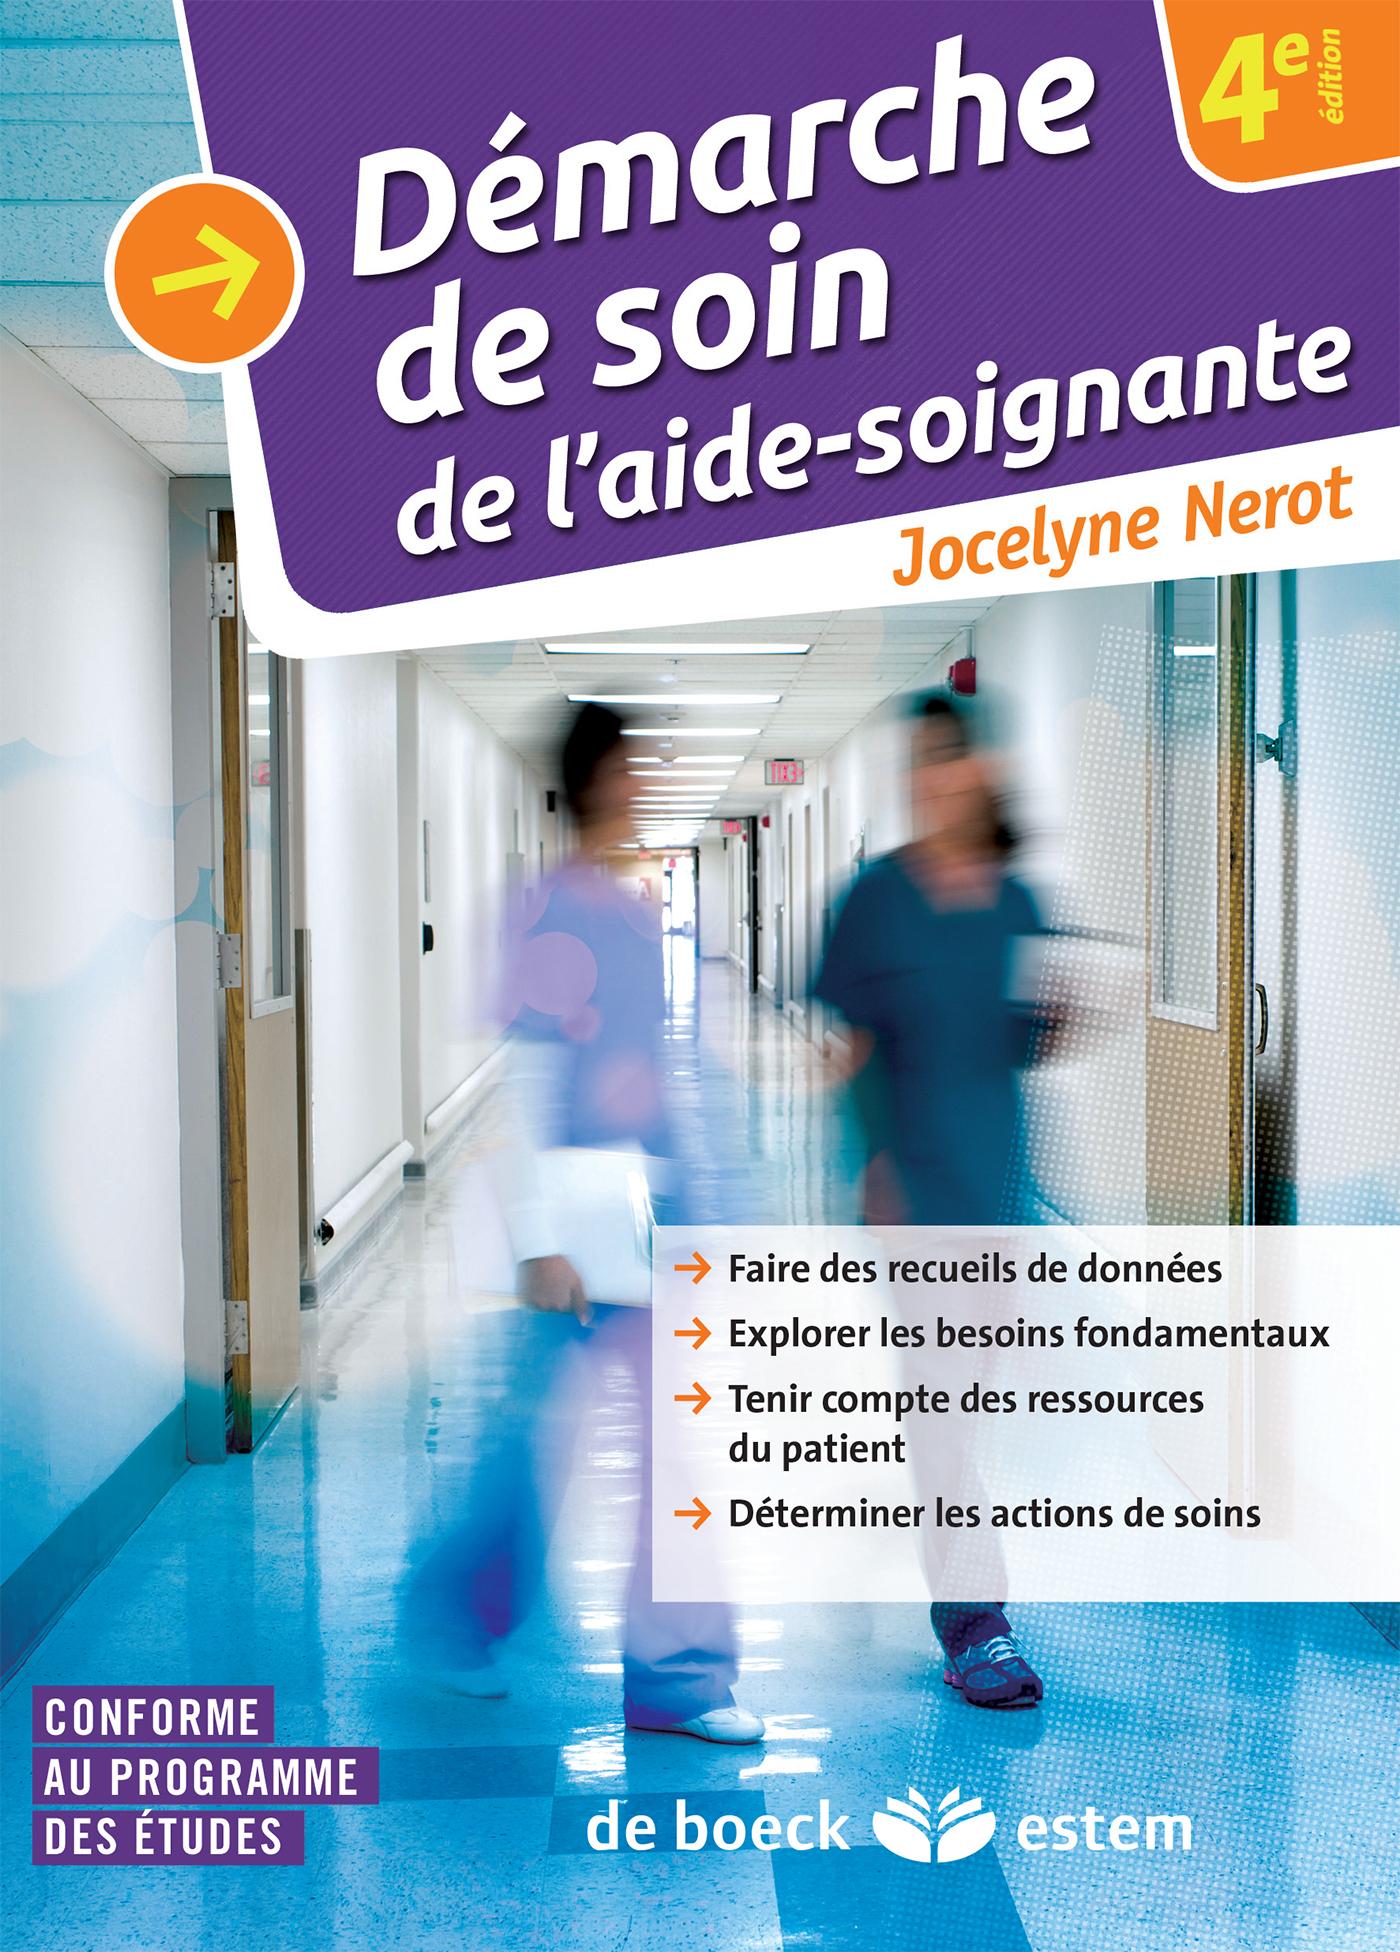 DEMARCHE DE SOIN DE L'AIDE-SOIGNANTE